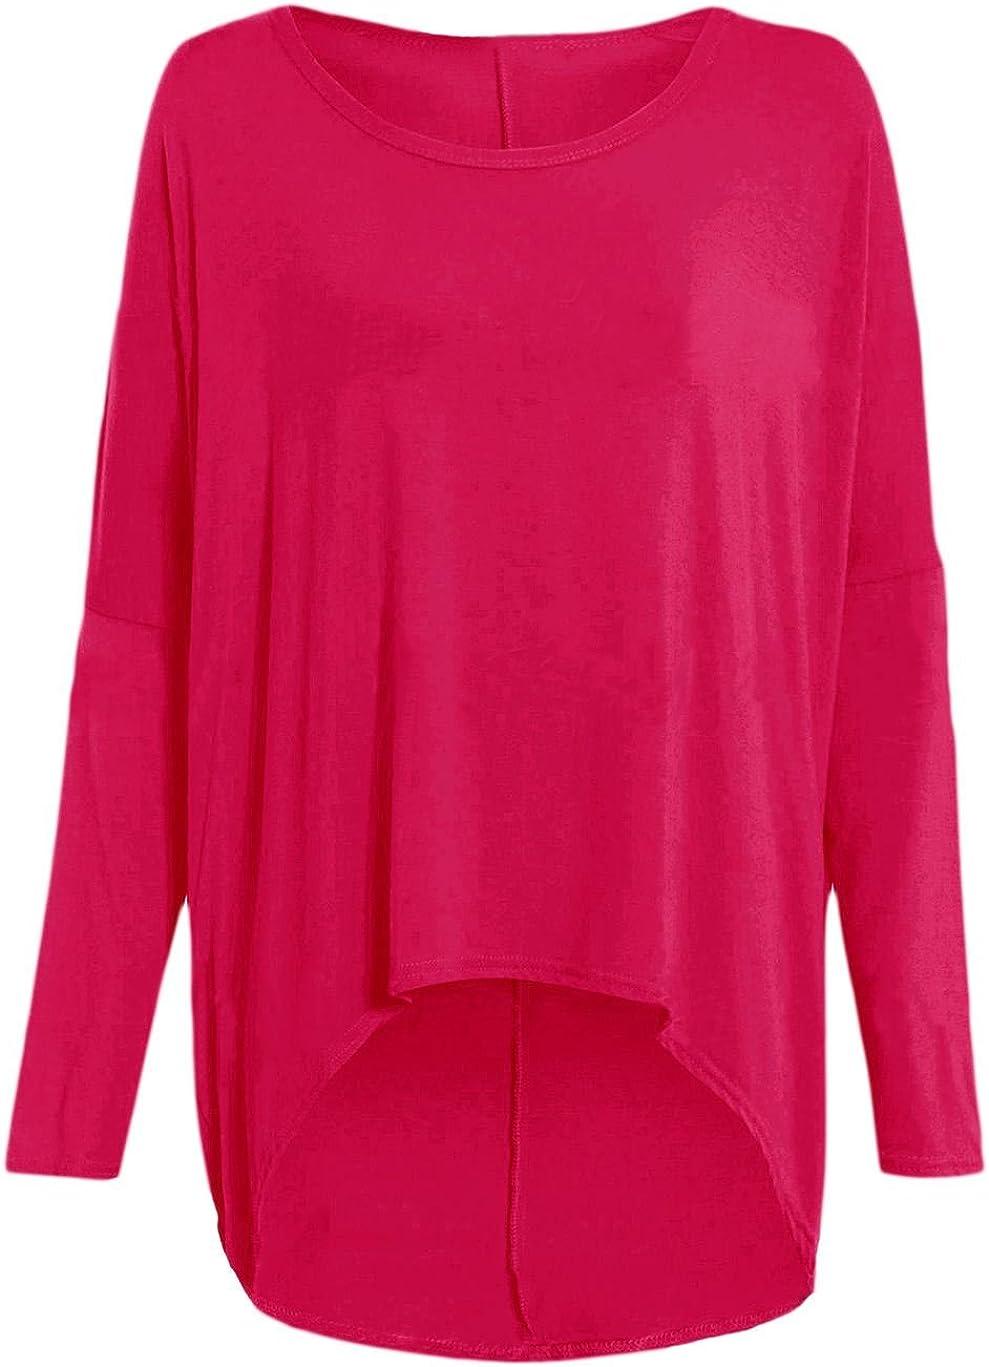 New Ladies Long Sleeve Shoulder Cut Out Leotard  Bodysuits 8-22